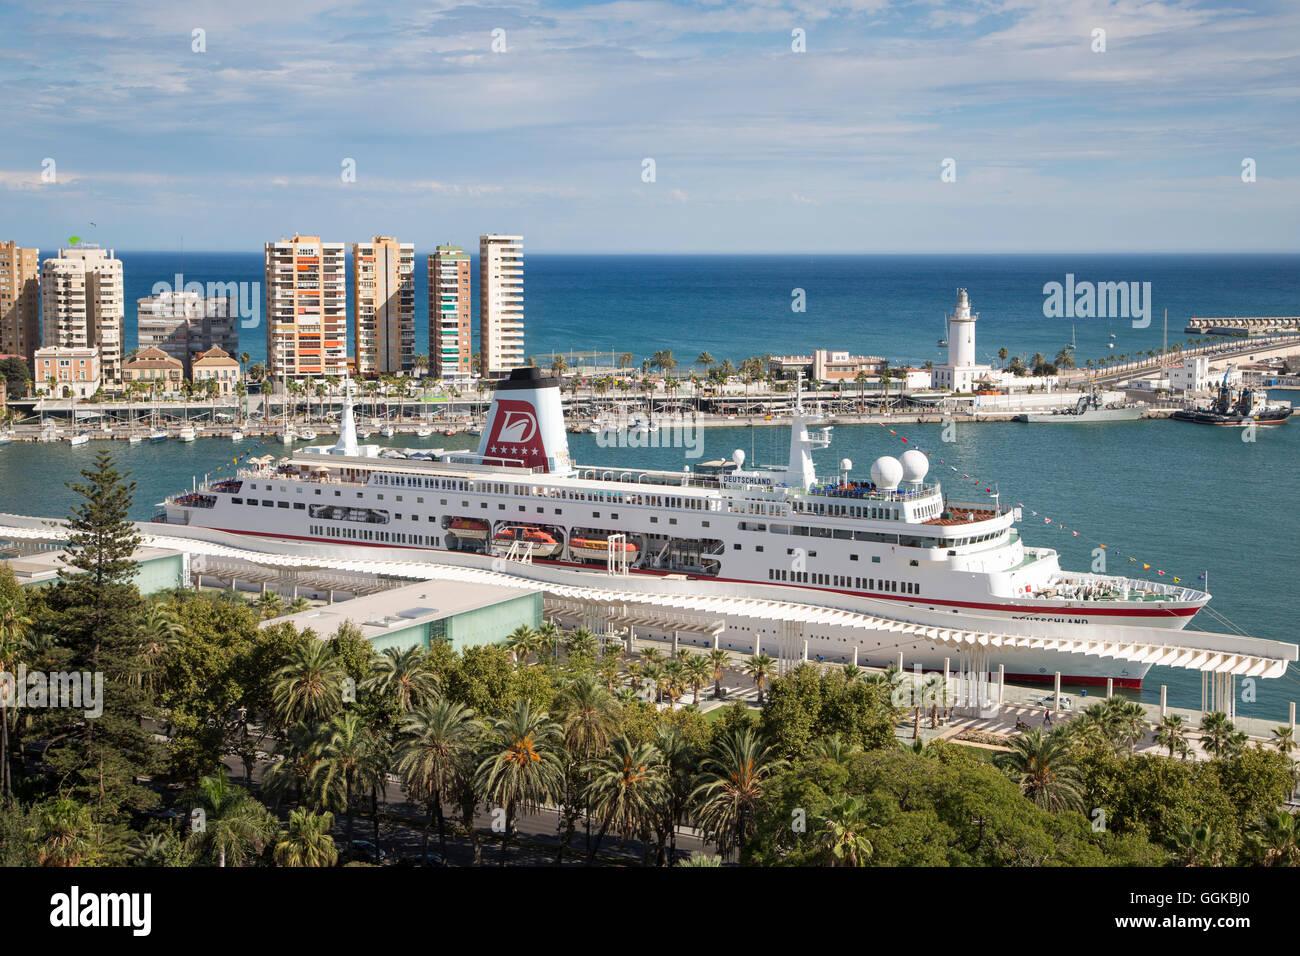 Palm trees and cruise ship MS Deutschland (Reederei Peter Deilmann) at Malaga Cruise Terminal, Malaga, Andalusia, - Stock Image